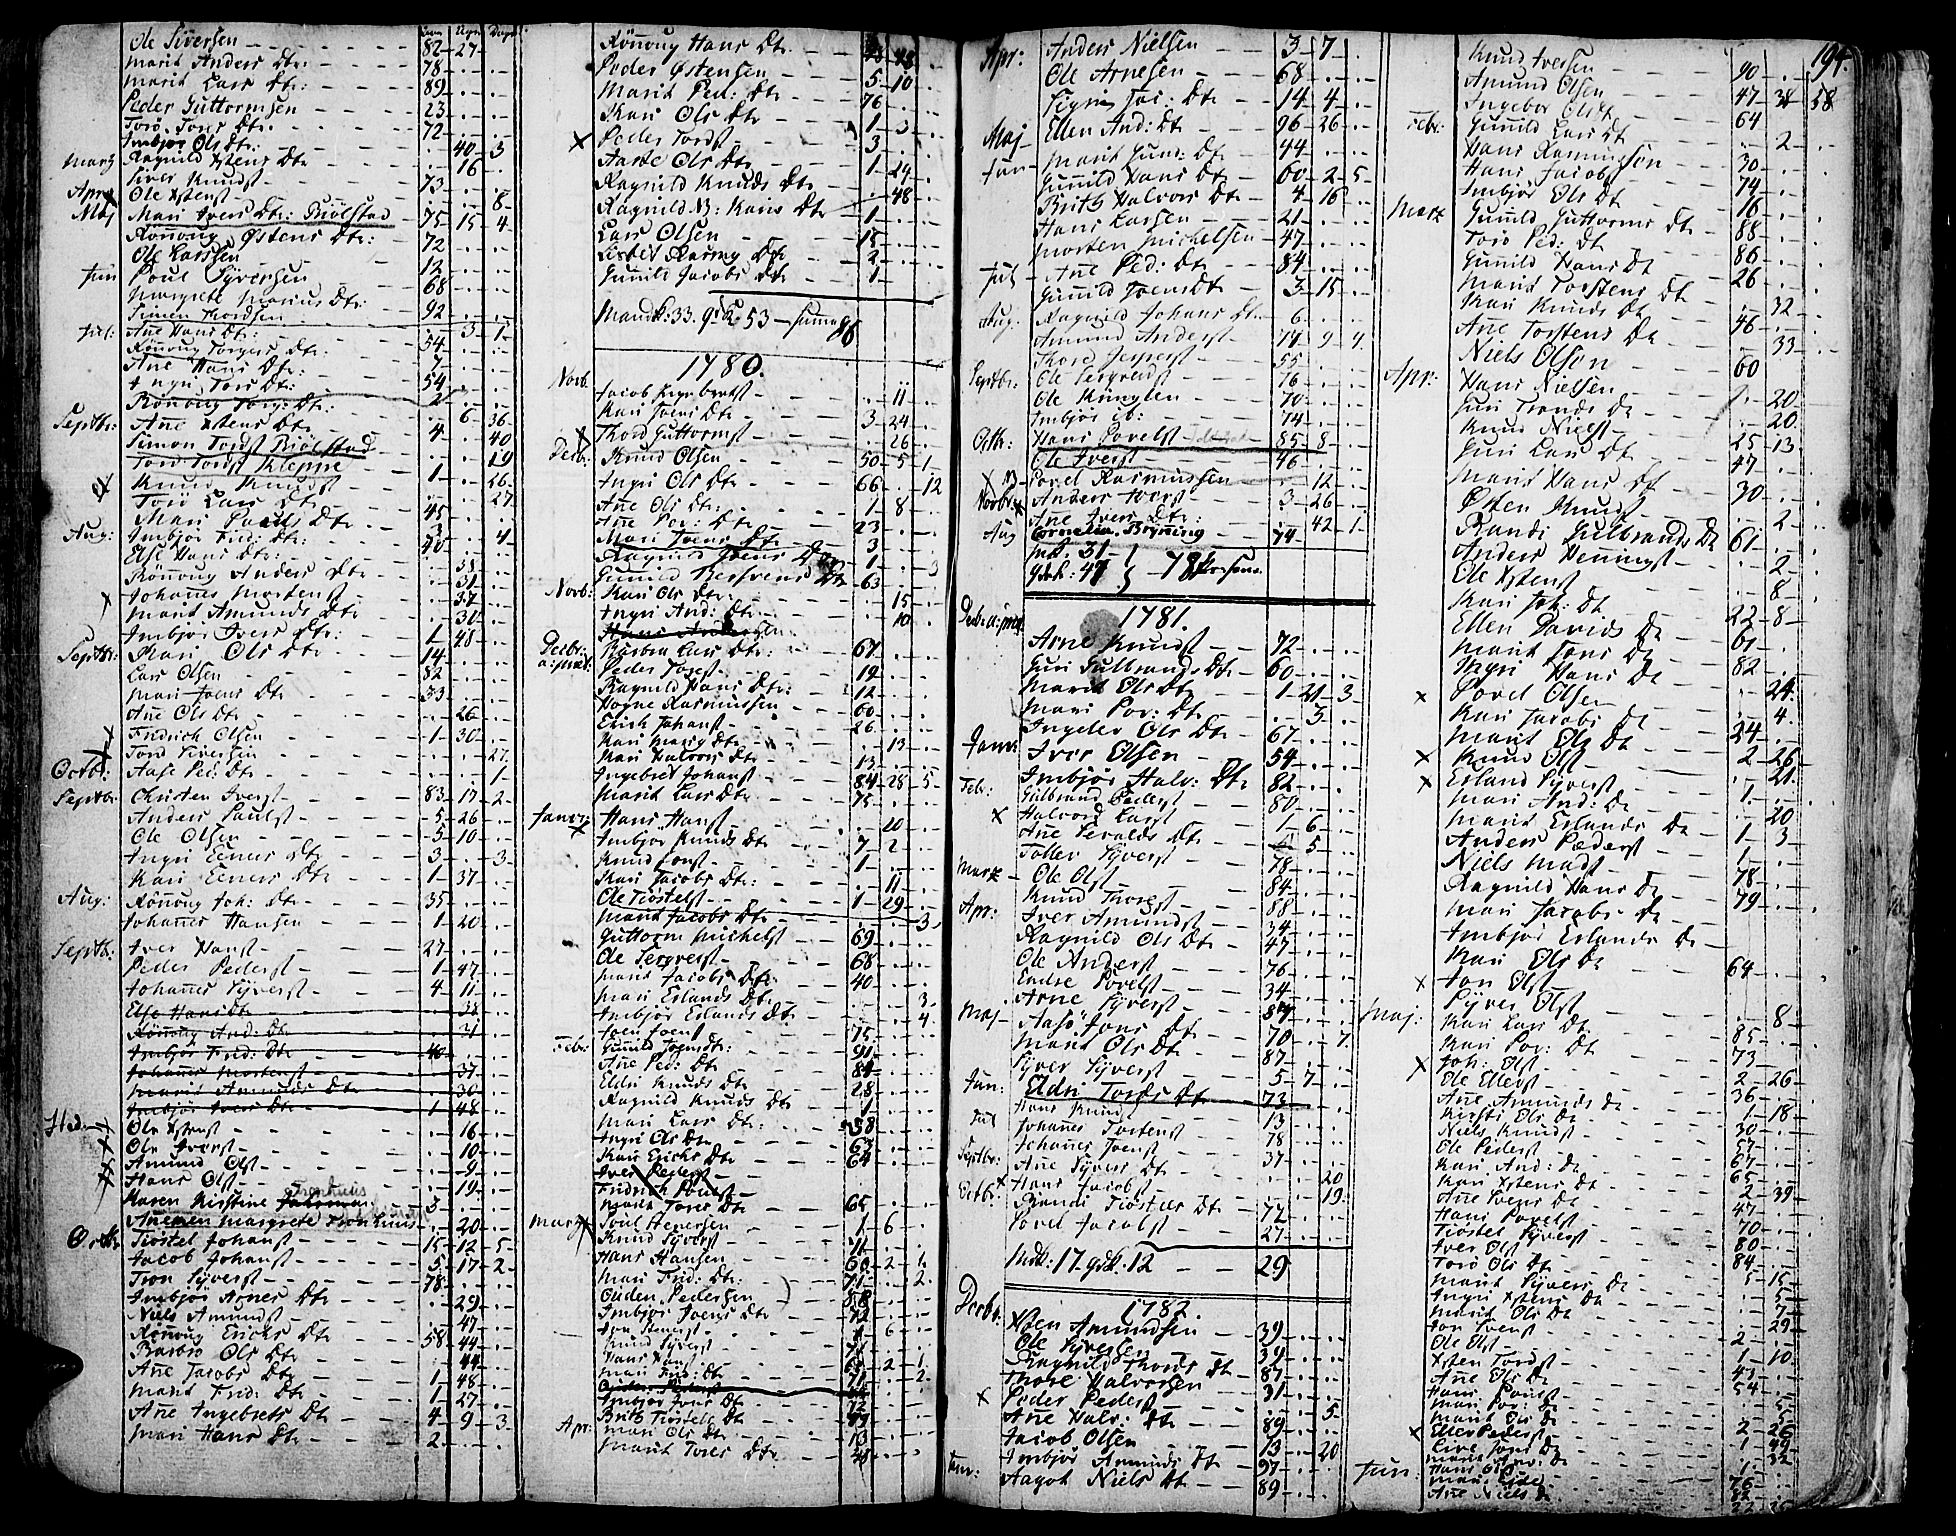 SAH, Vågå prestekontor, Ministerialbok nr. 1, 1739-1810, s. 194